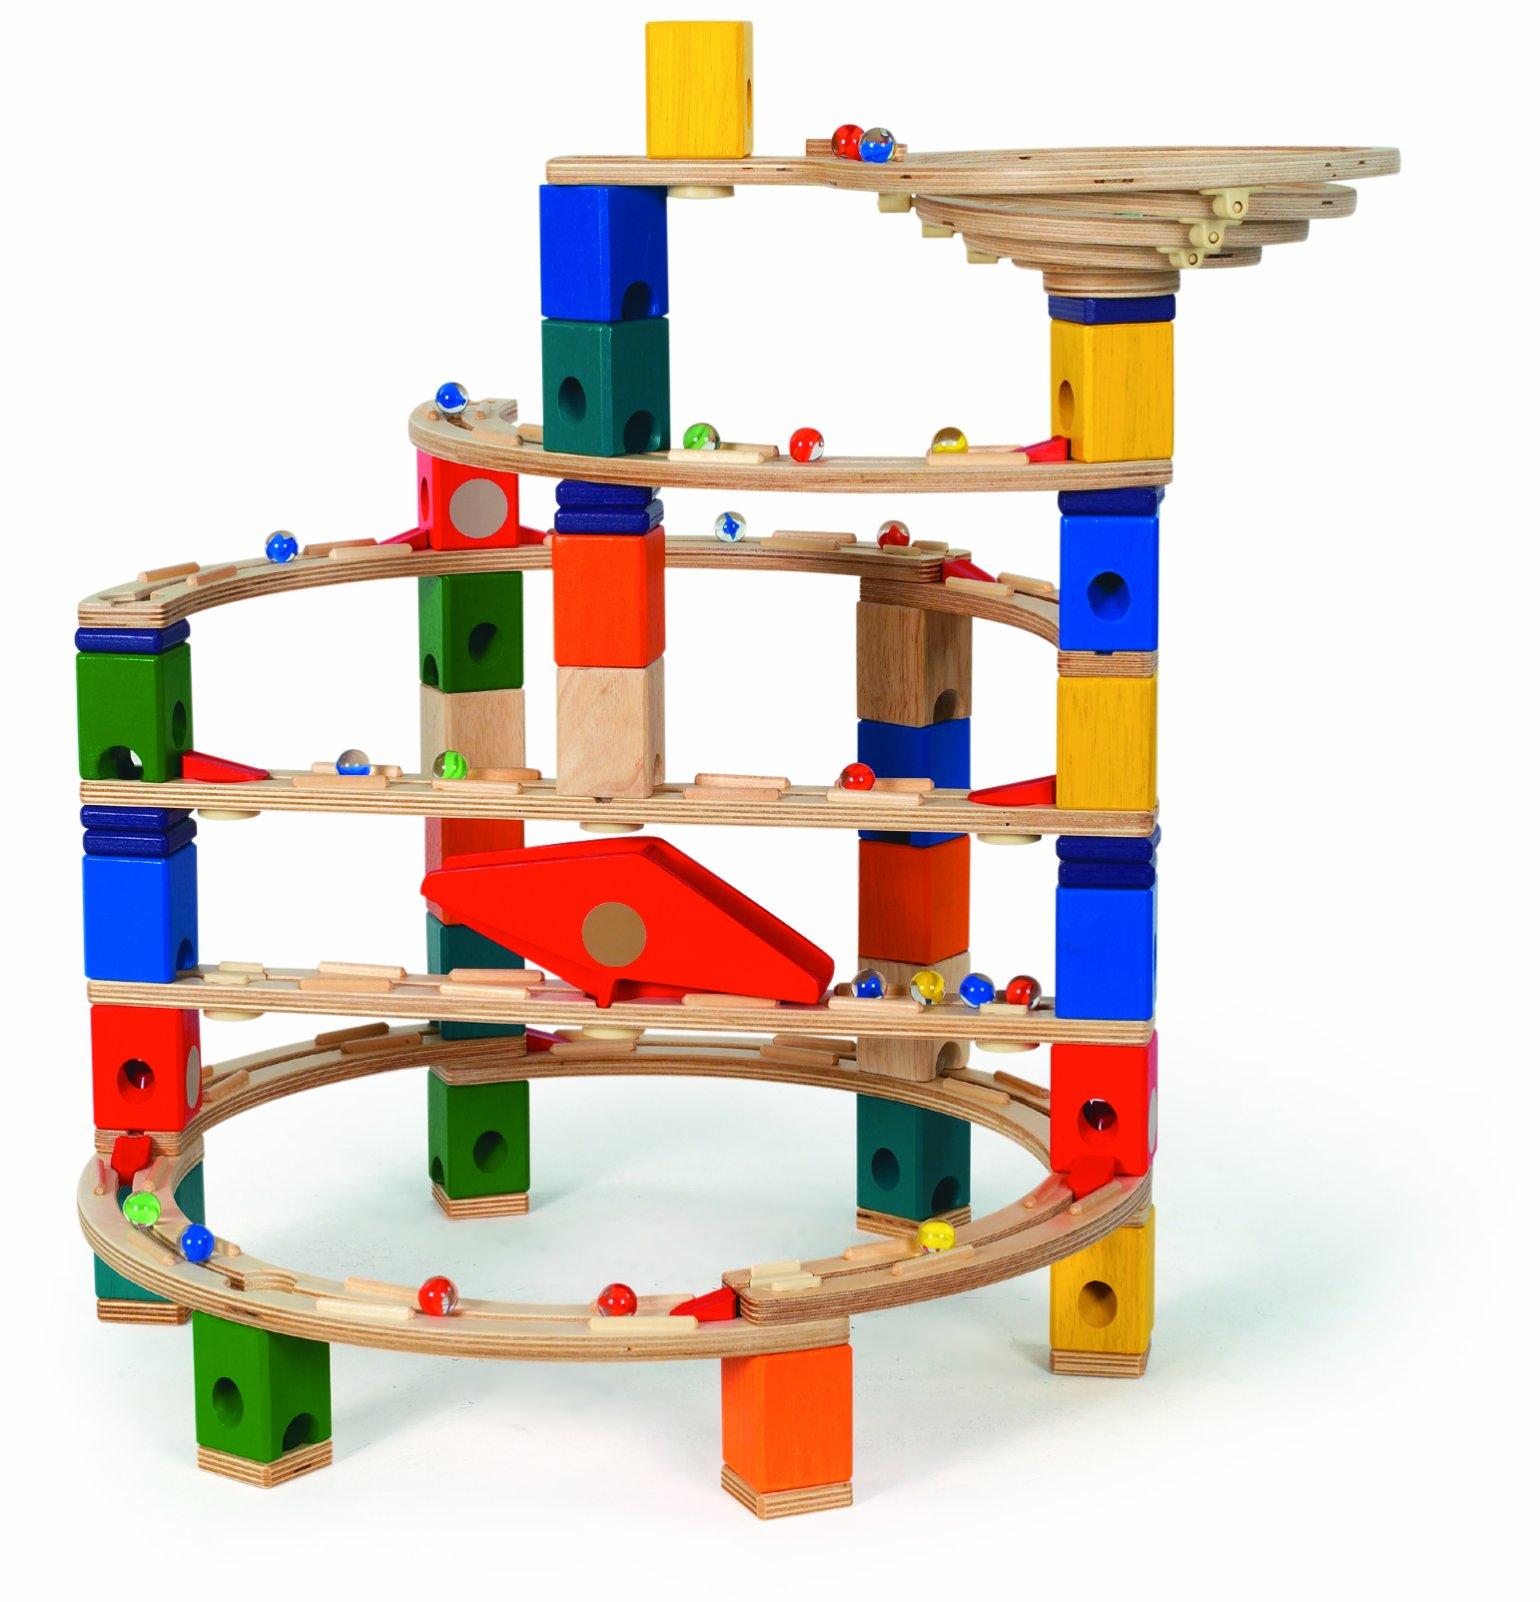 Hape Quadrilla Wooden Marble Run Construction Twist and Rail Add On Set